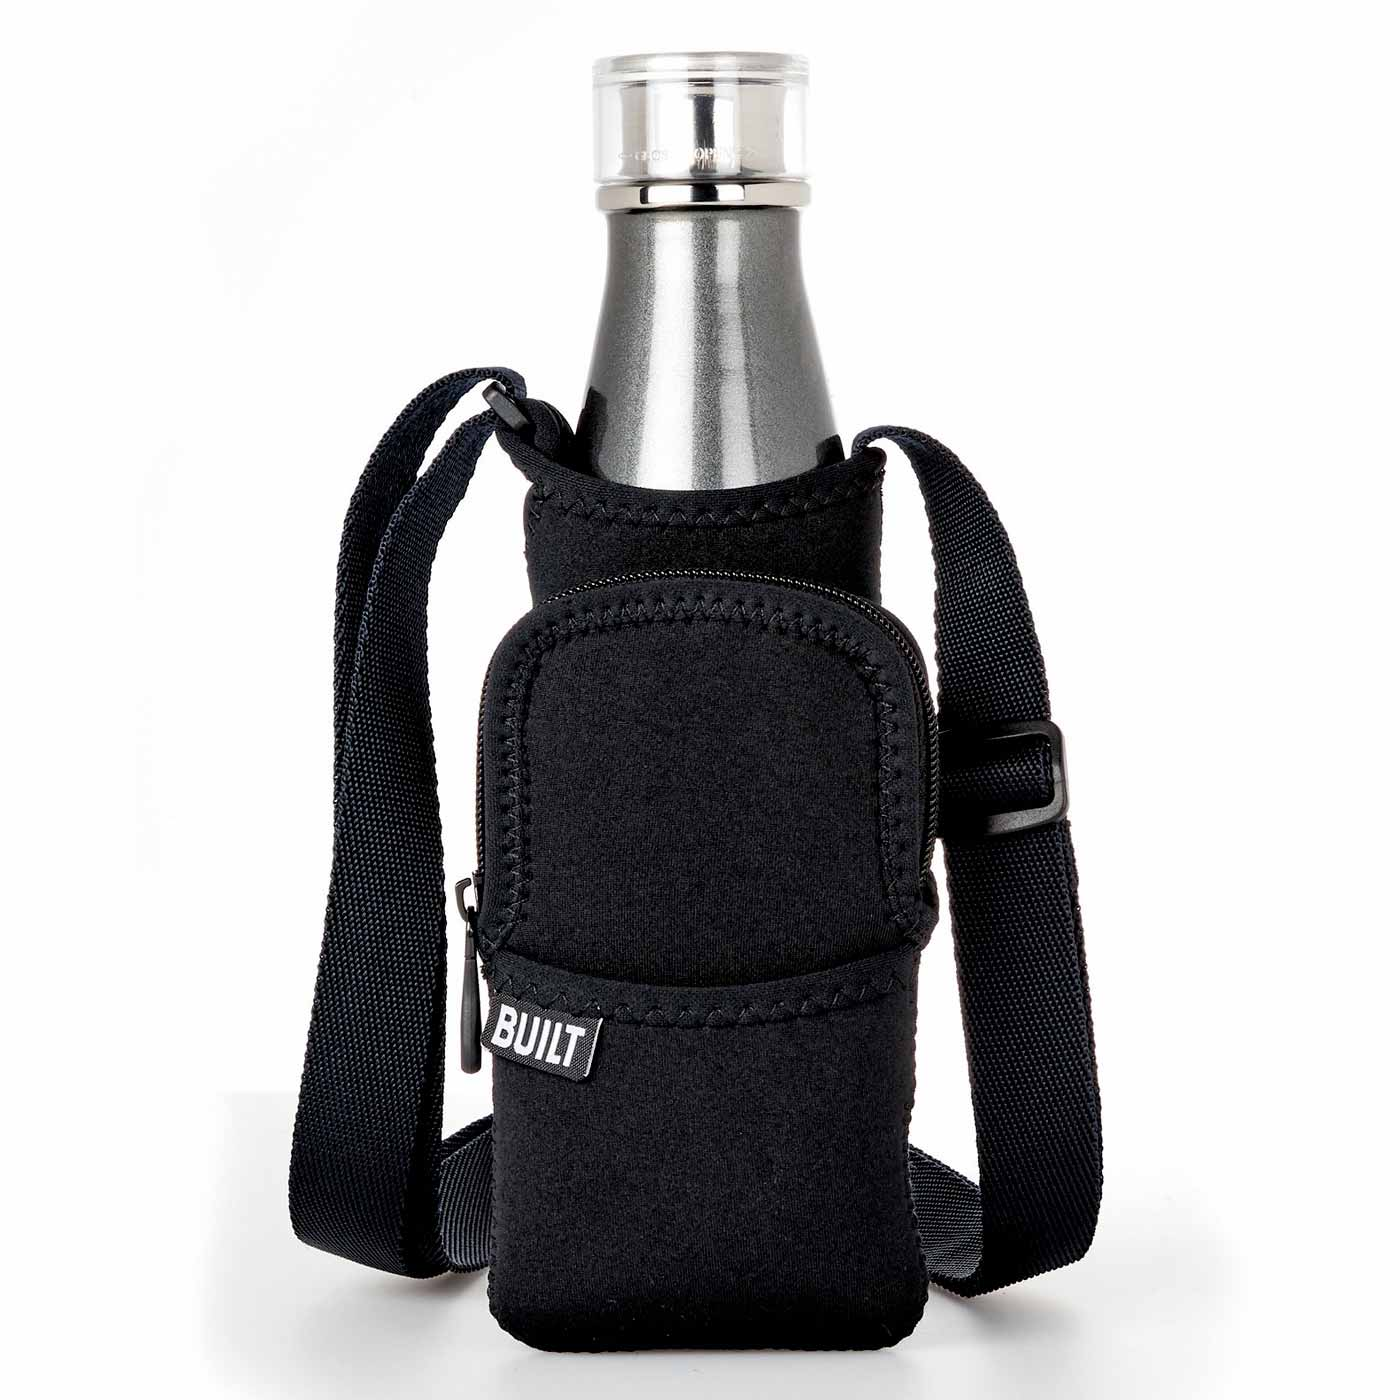 Kraso[クラソ] |ドリンクもスマホもスマートに身に着ける 丸洗いOKのボトルスリング〈ブラック〉|約500~700mlペットボトル対応。